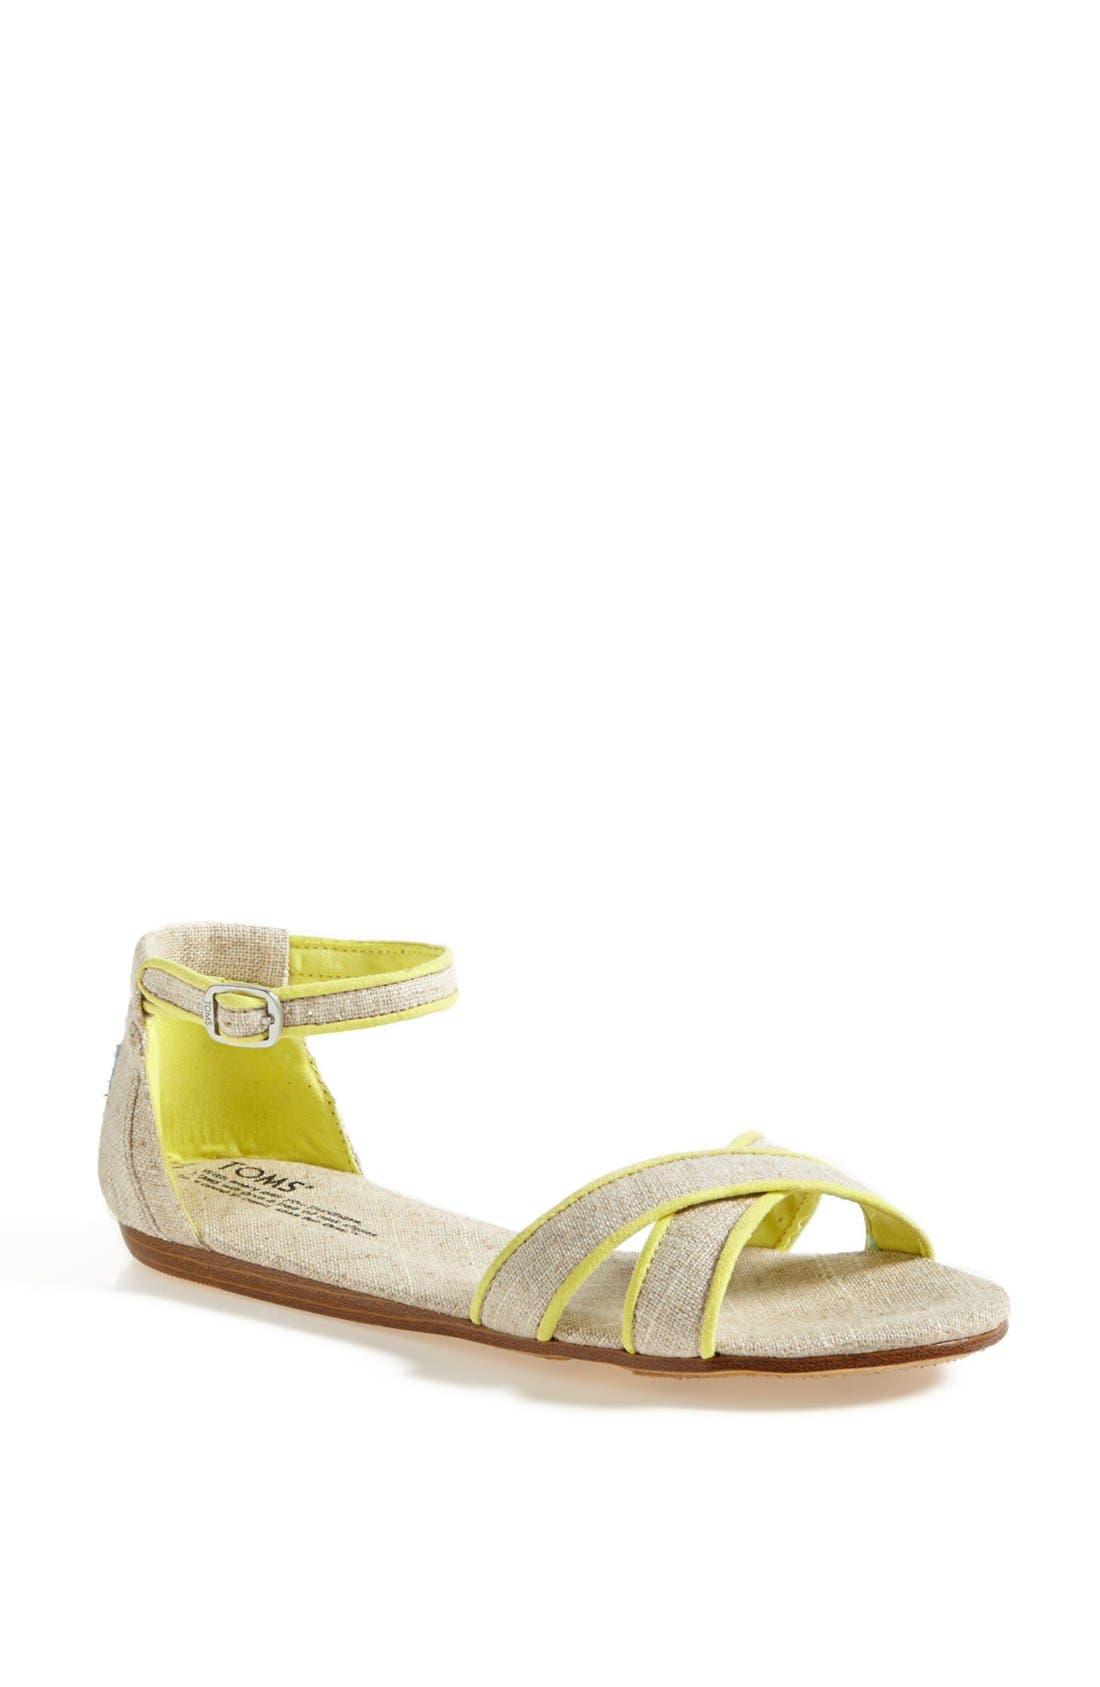 Main Image - TOMS 'Correa' Ankle Strap Flat Sandal